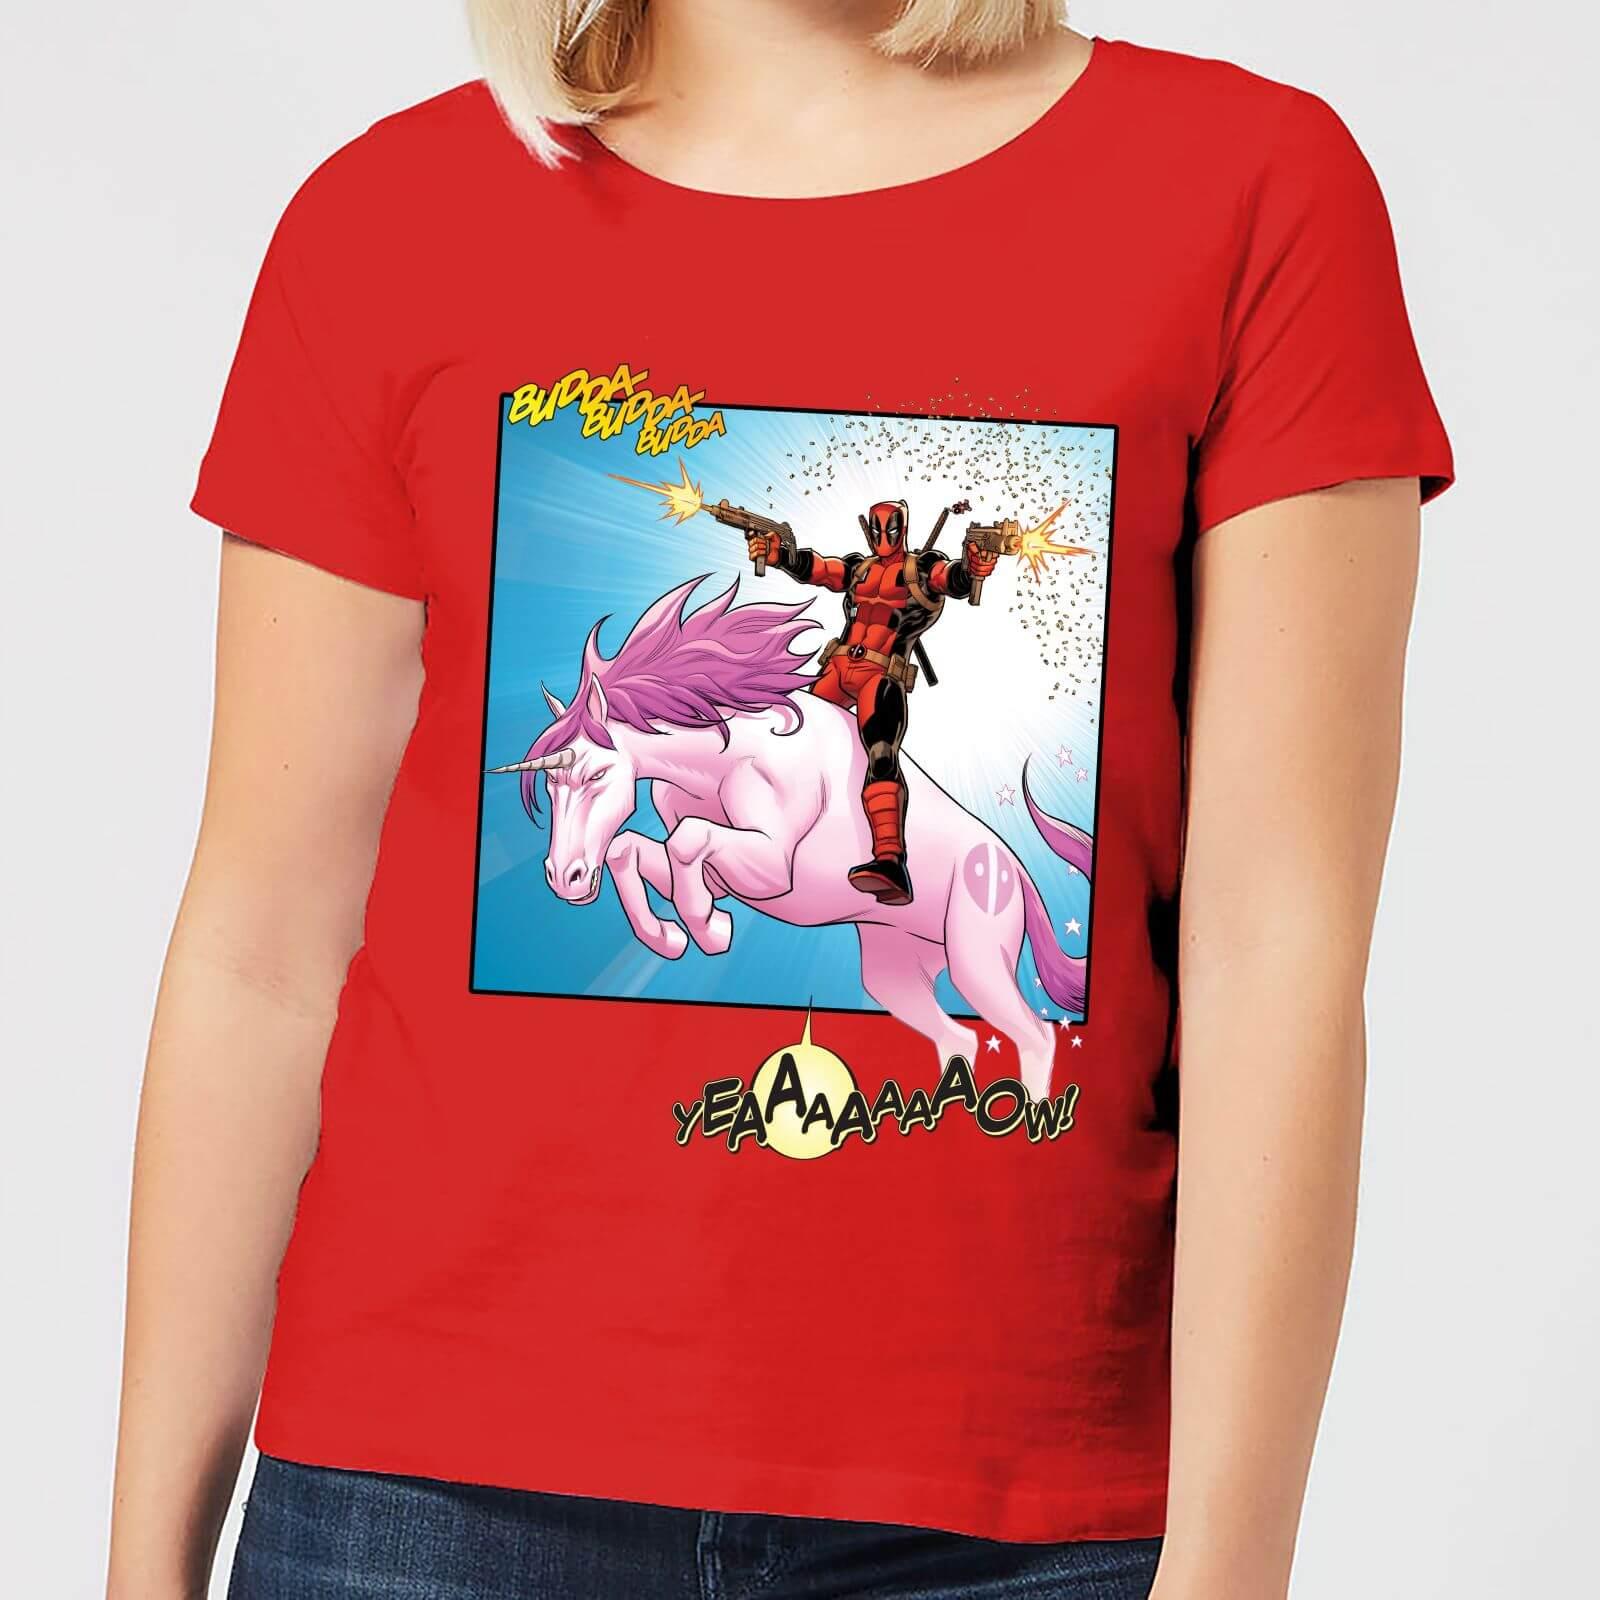 OfferteWeb.click 71-t-shirt-marvel-deadpool-unicorn-battle-rosso-donna-xxl